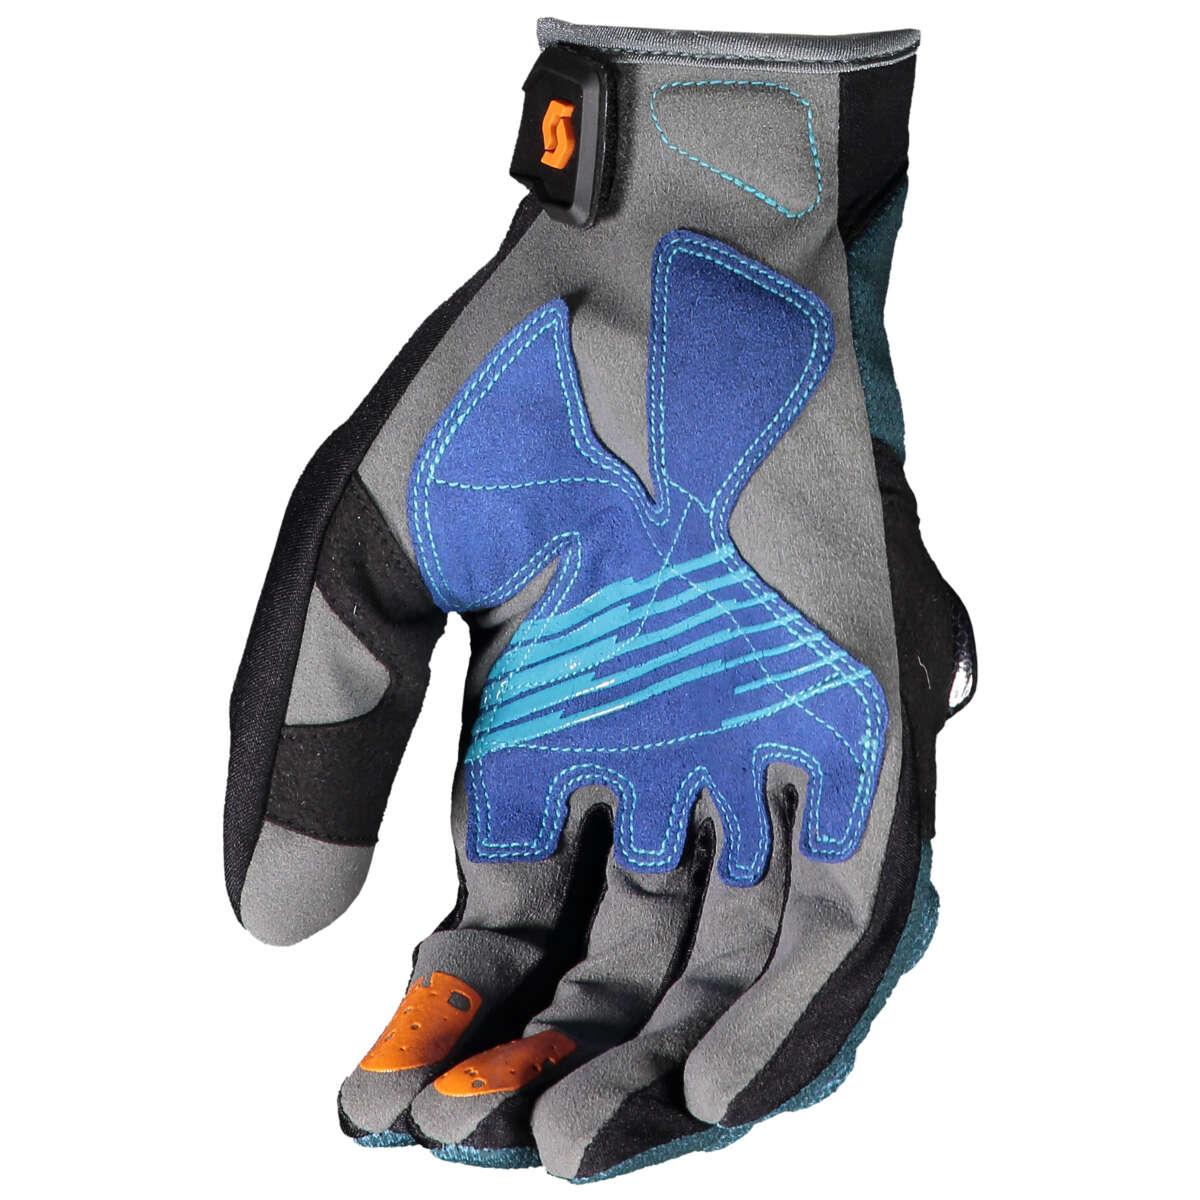 Scott Handschuhe Handschuhe Scott DH Pro Nightfall Blau/Mandarin Orange 16a5bc